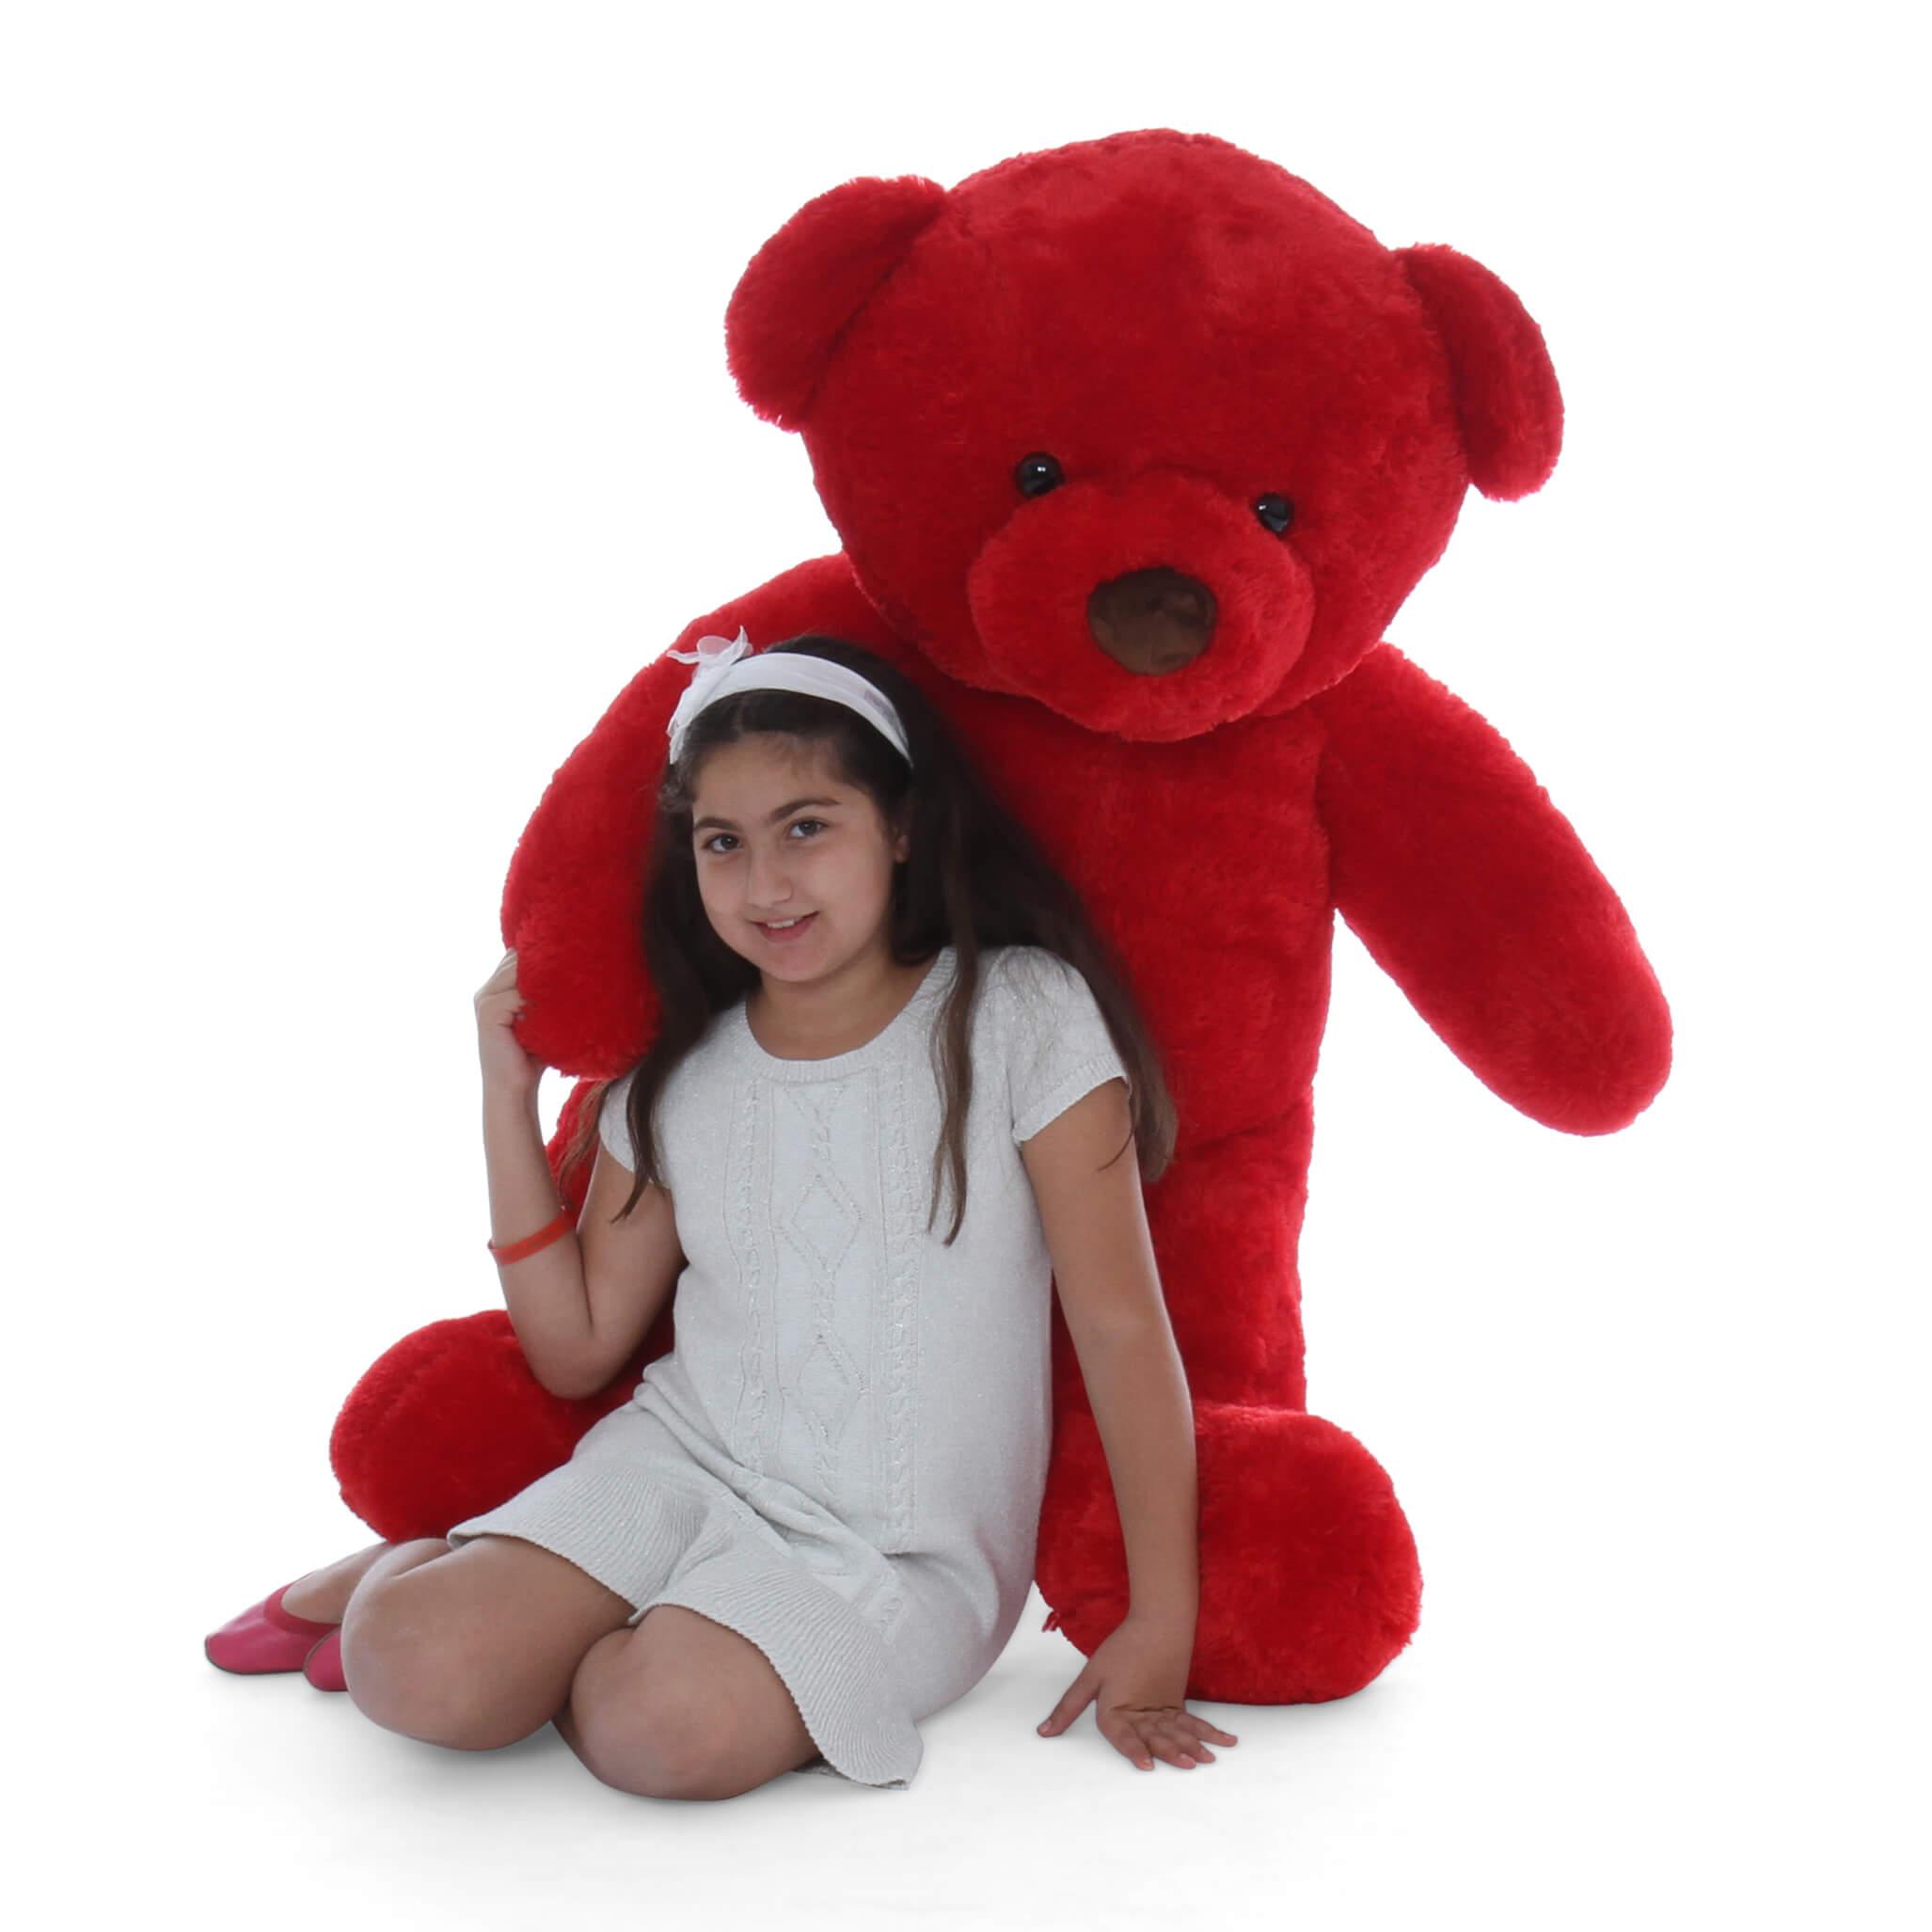 adorable-huggable-extra-giant-soft-plush-teddy-bear-48in-plump-red-riley-chubs-1.jpg